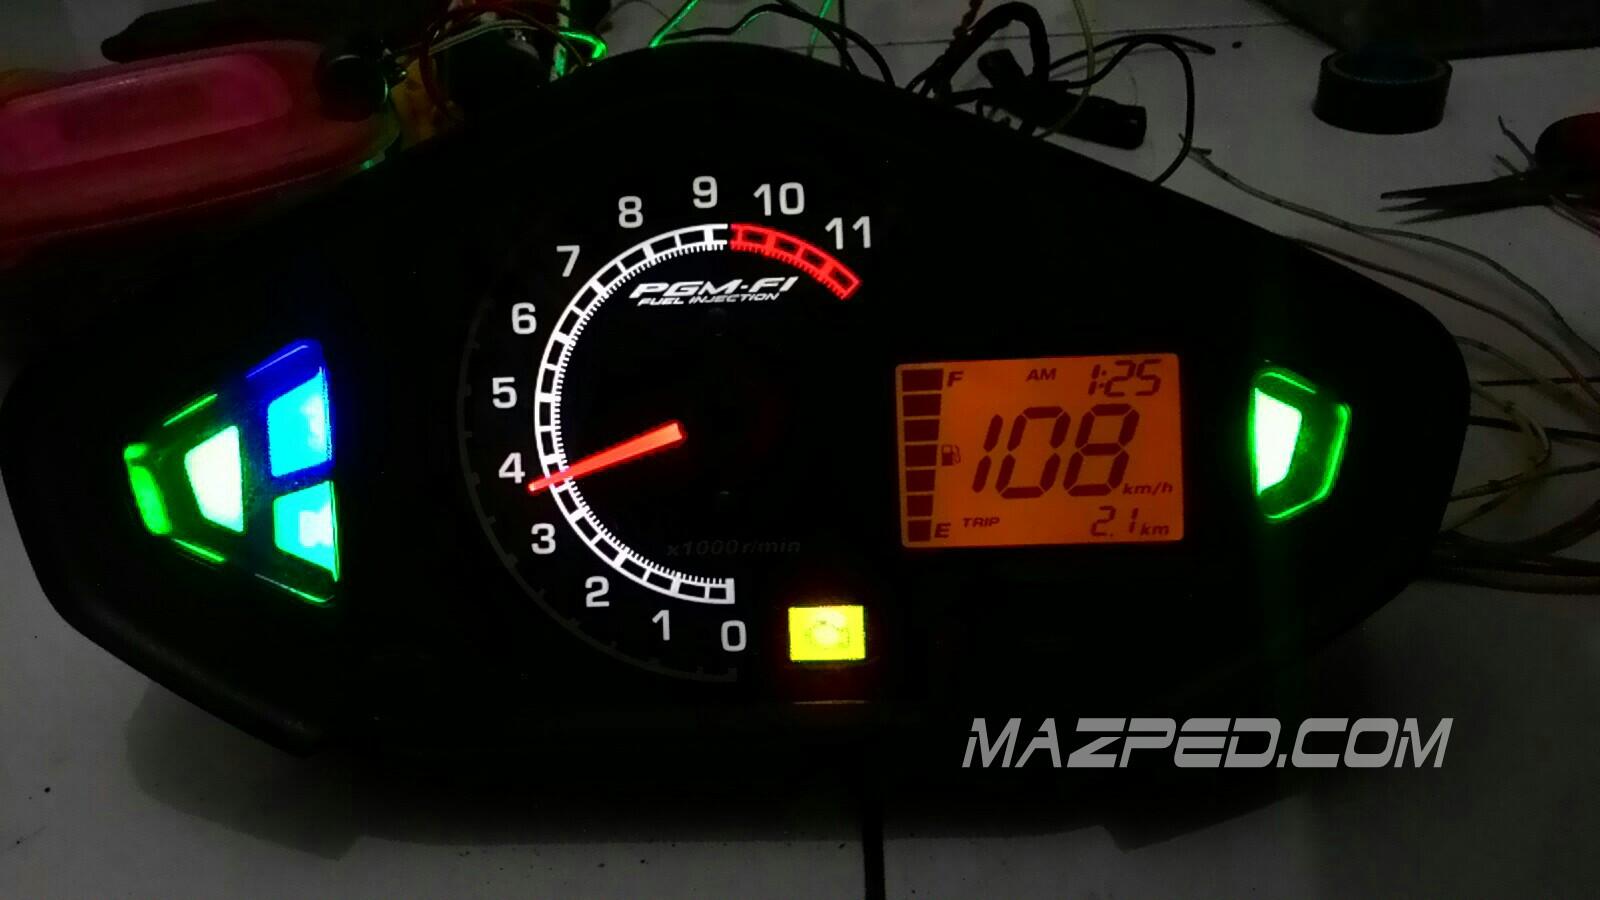 Wiring Diagram Spido Hi Bro New Vixion Lighting 25 Mei 2013 Mazpedia Com Pasang Nmp Di